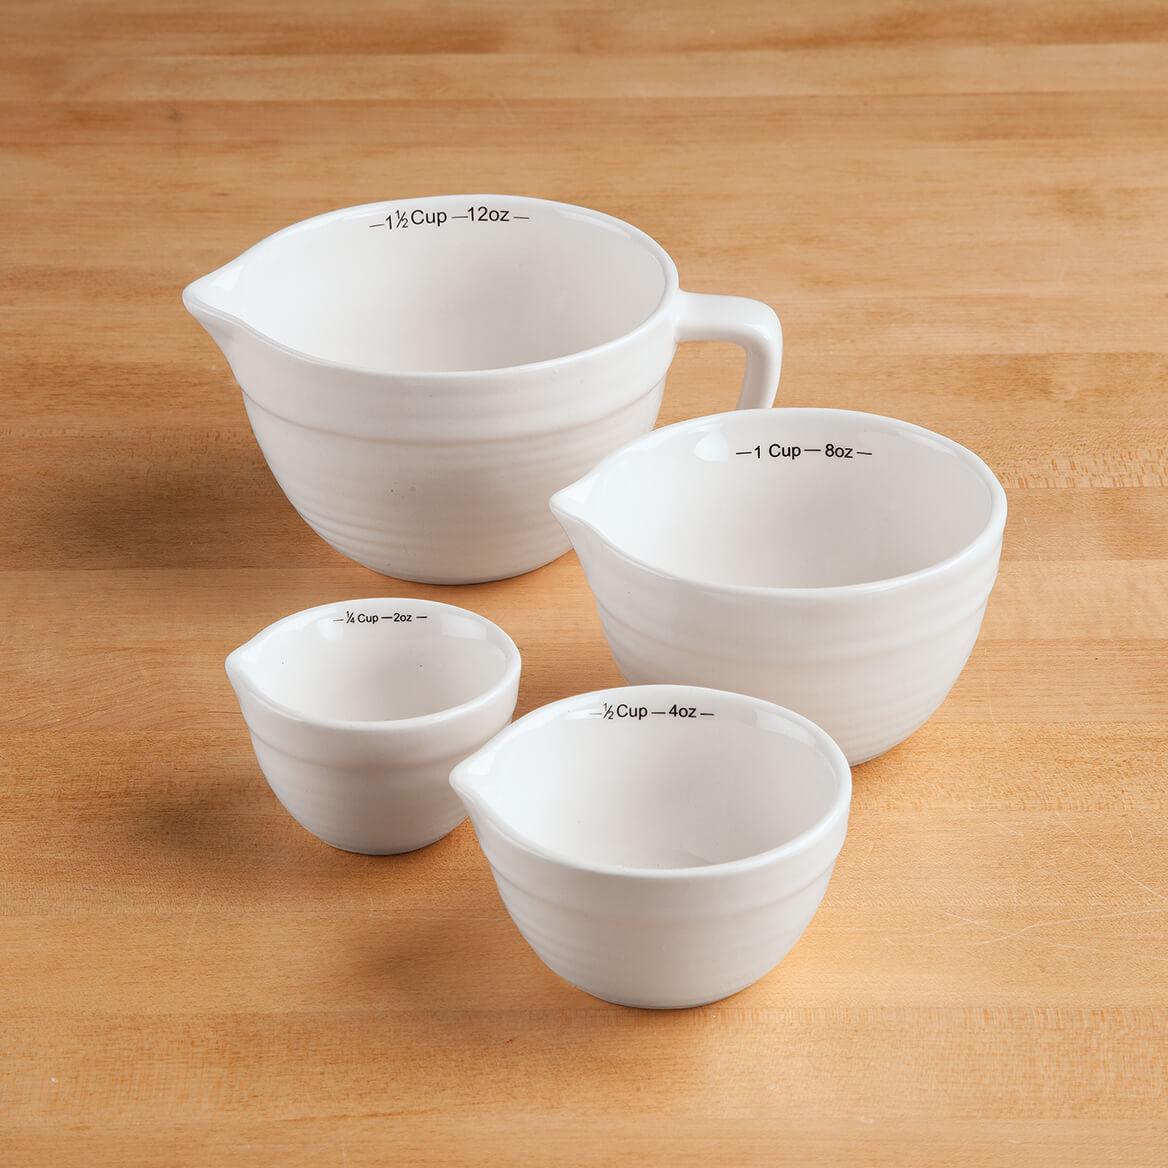 4 Piece Ceramic Measuring Cups-367623